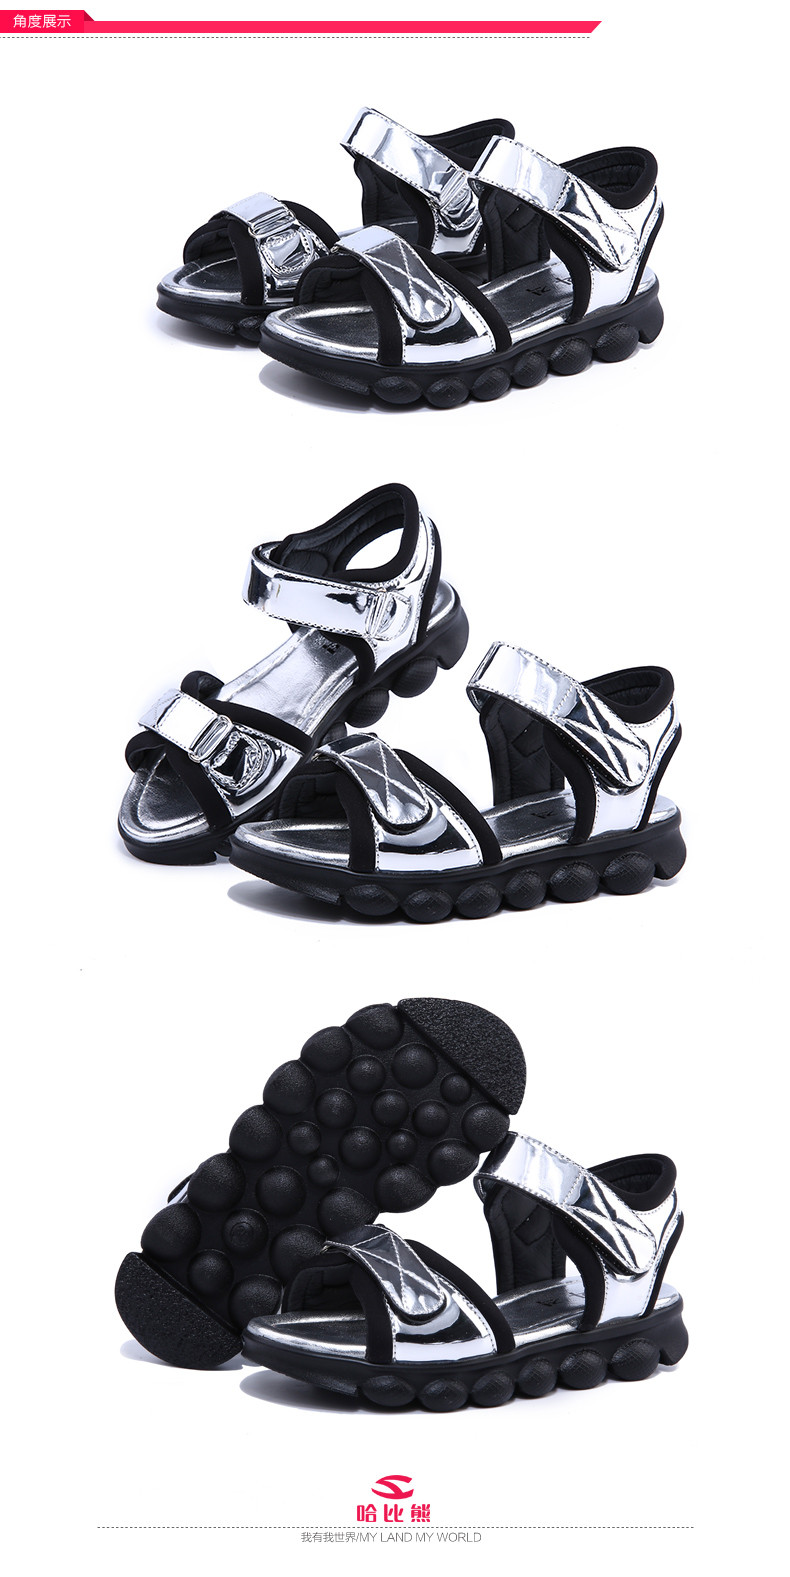 Hobibear China Shoes Factory Fancy Pu Sole Sandals For Girls